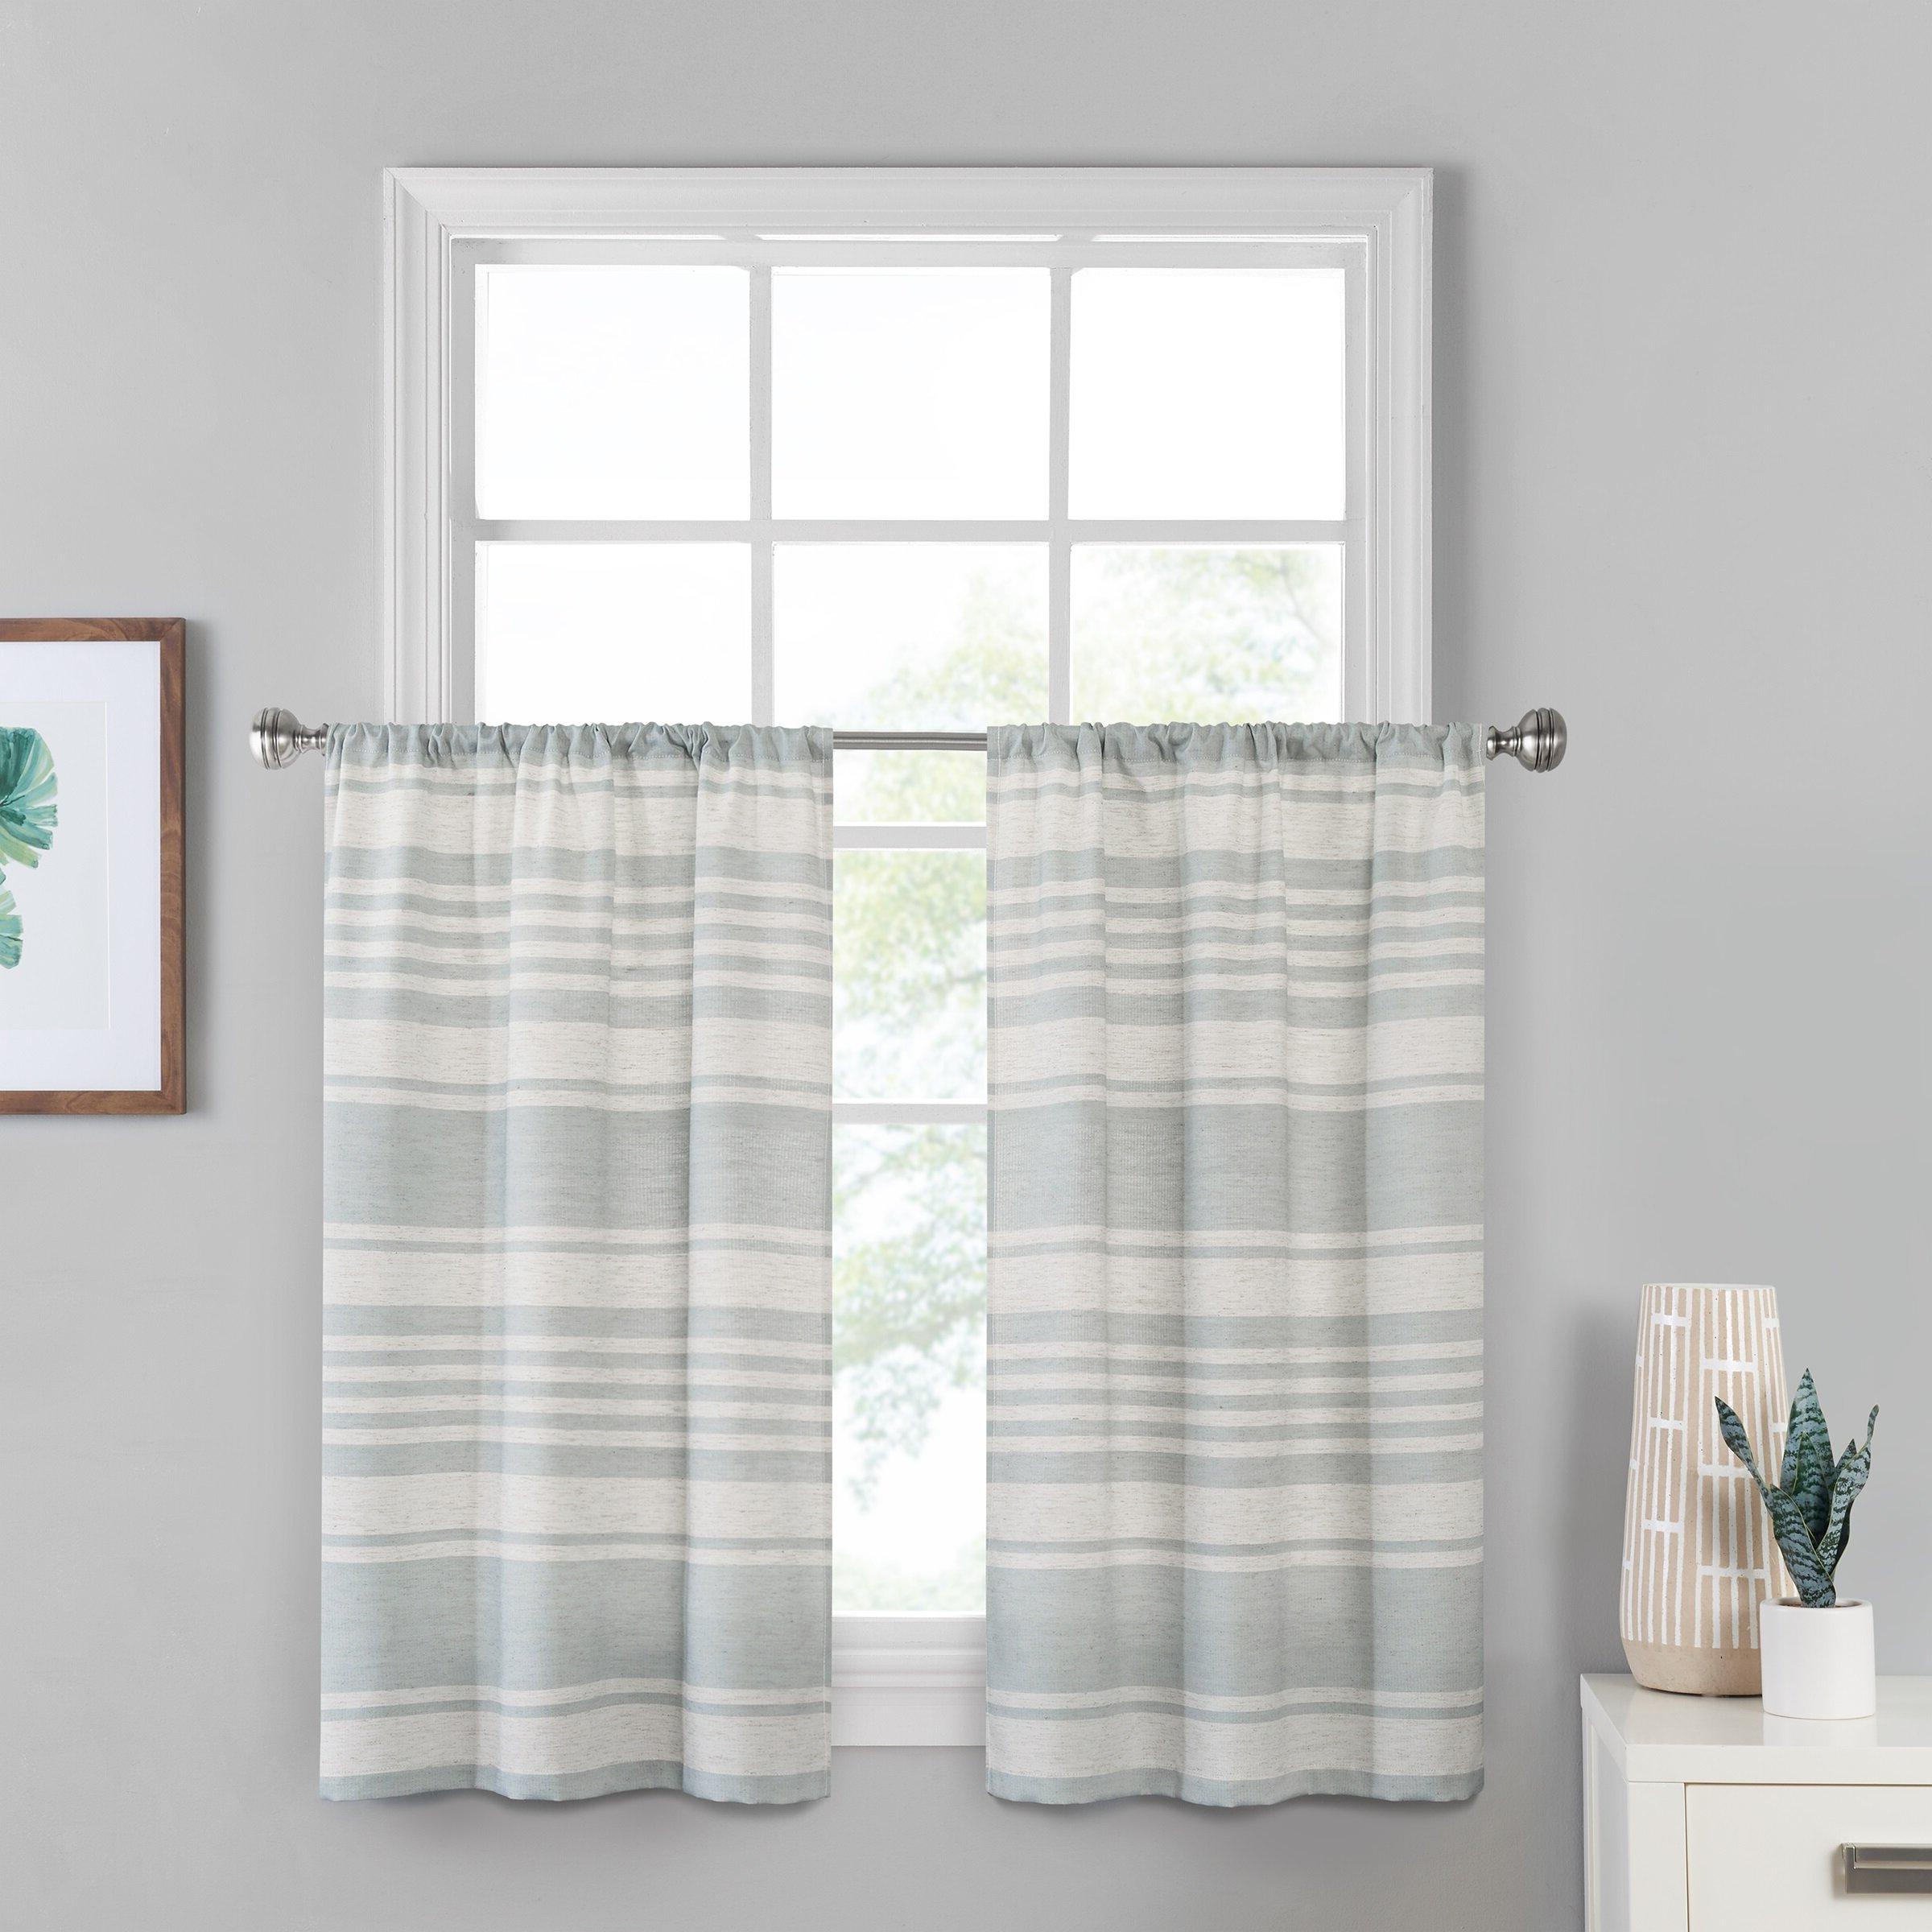 Latest Scheffler Window Solutions Kitchen Curtain Regarding Pintuck Kitchen Window Tiers (Gallery 19 of 20)